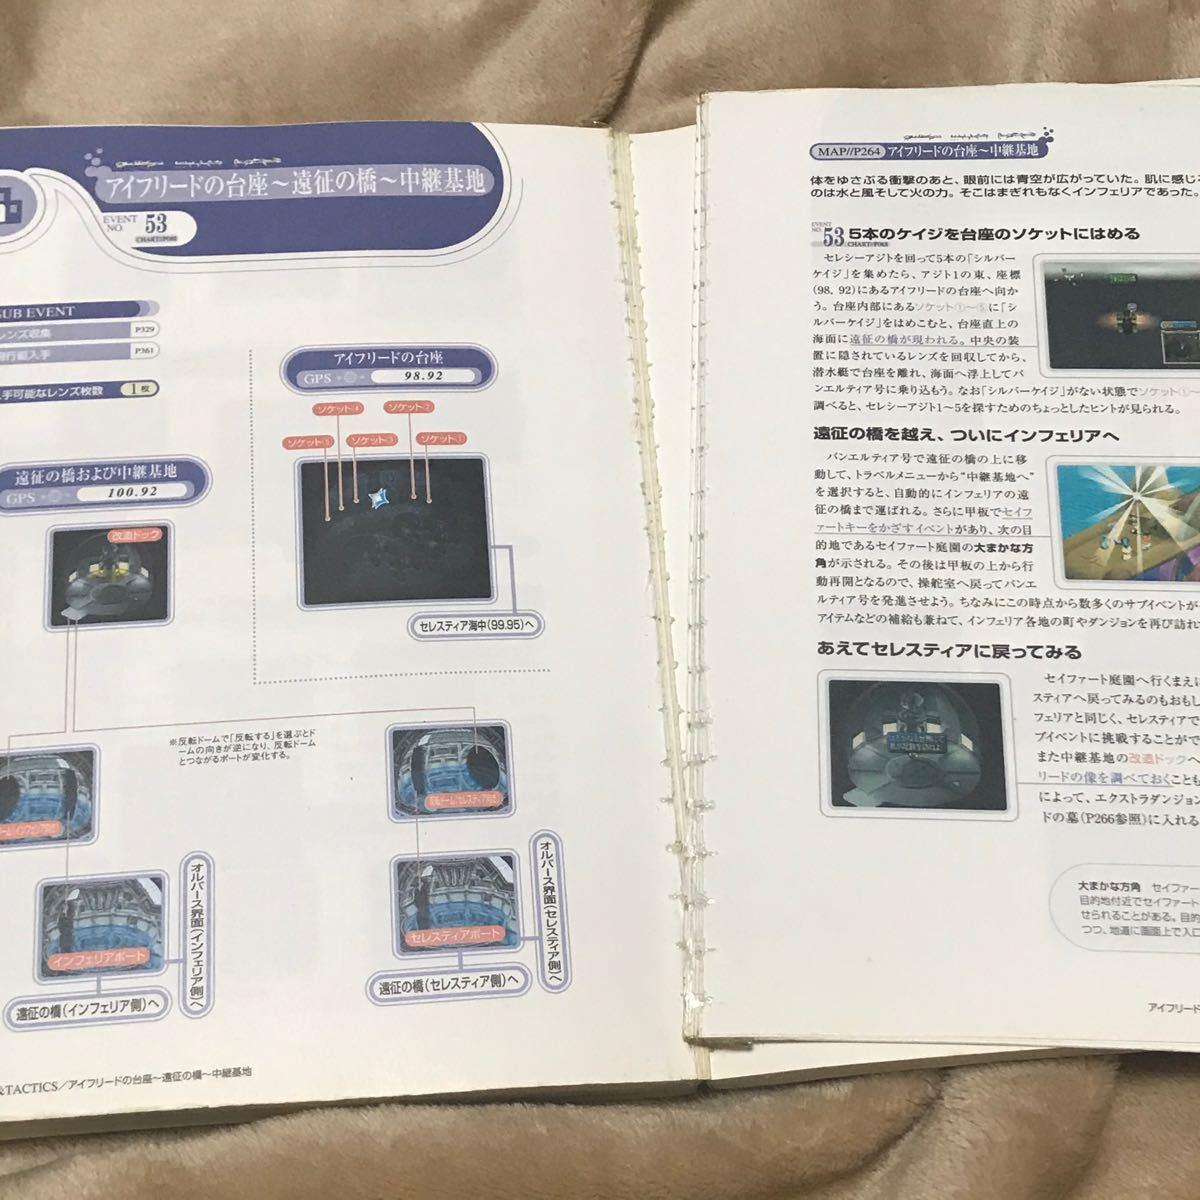 PS攻略本セット テイルズオブデスティニー オフィシャルガイドブック/ テイルズオブエターニア オフィシャルガイドブック